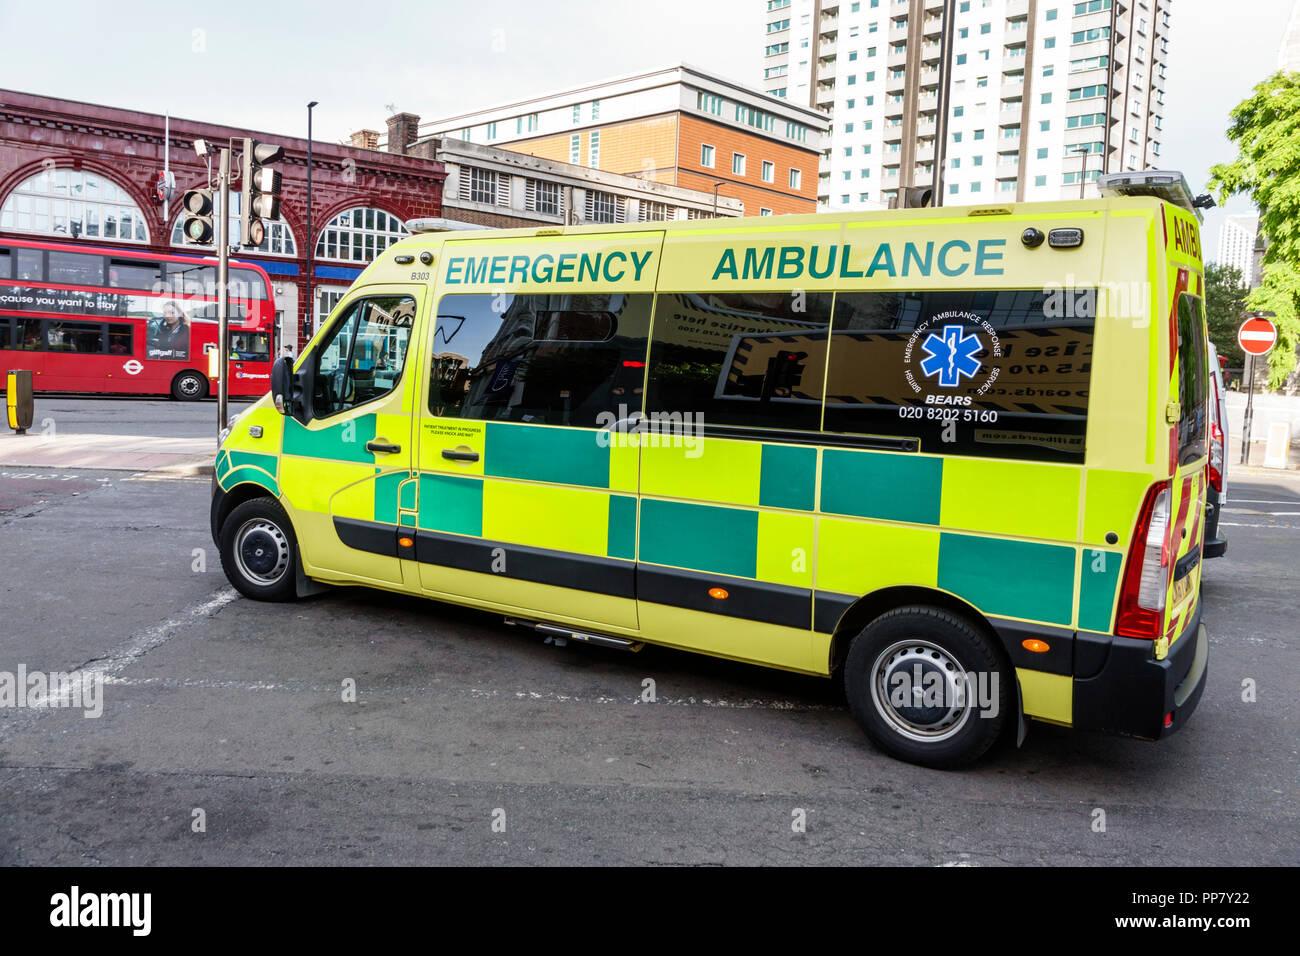 London England United Kingdom Great Britain South Bank Lambeth emergency vehicle transport ambulance National Health Service NHS British Emergency Amb - Stock Image